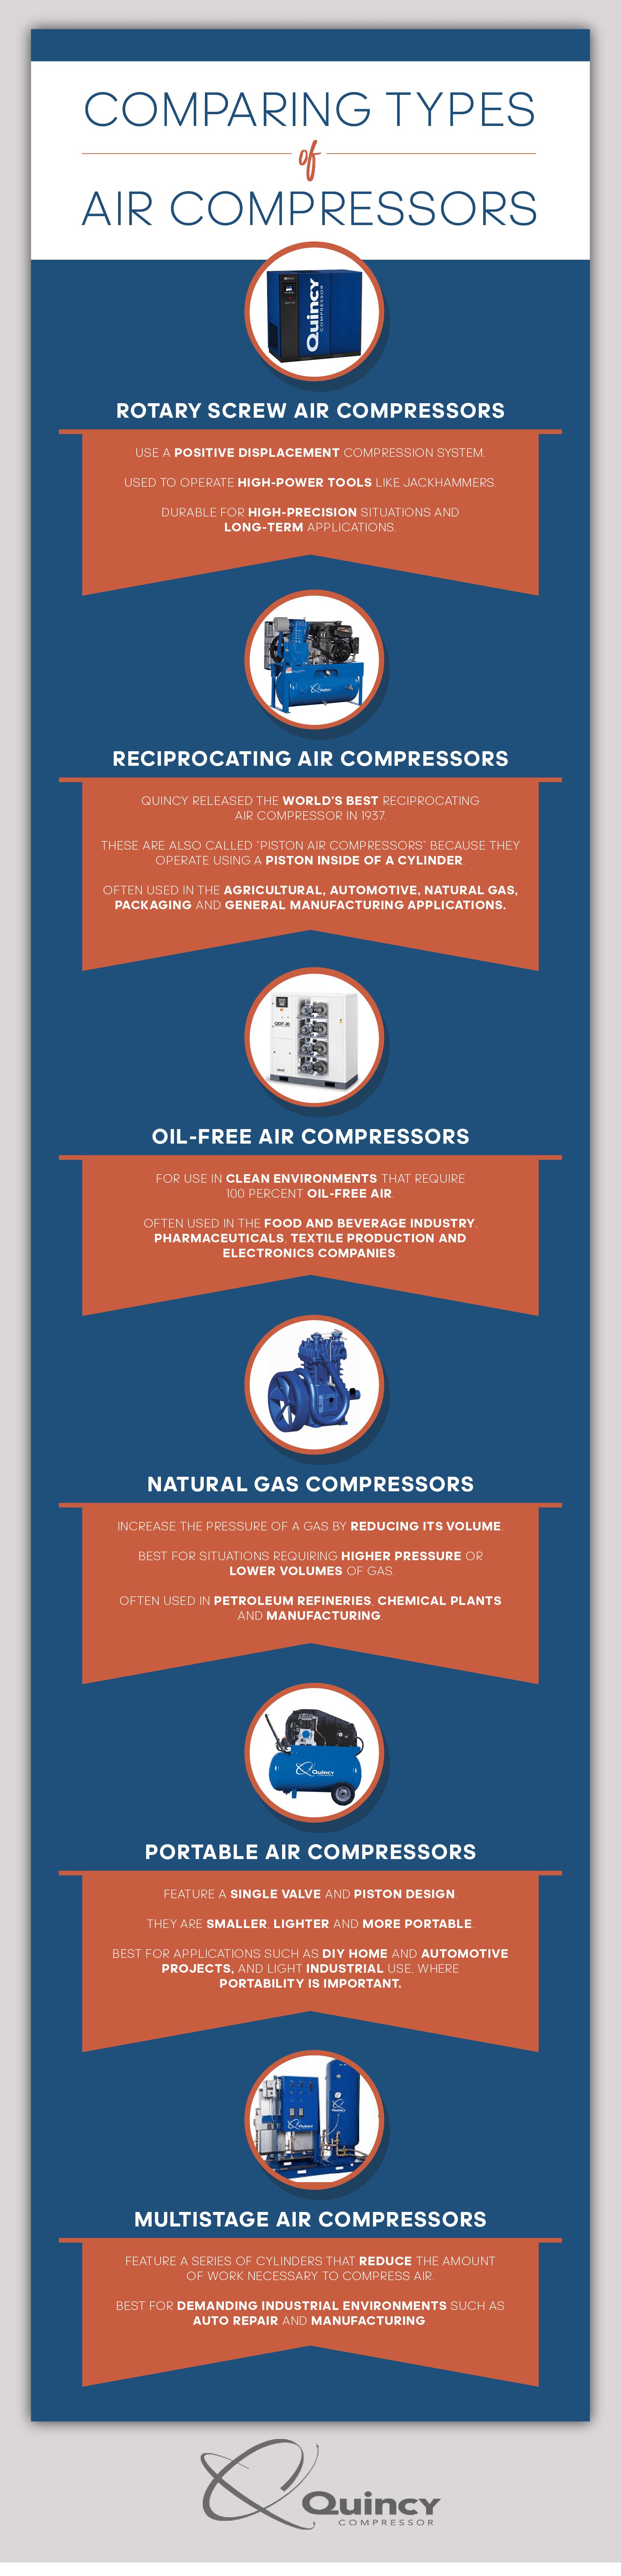 comparing air compressor types